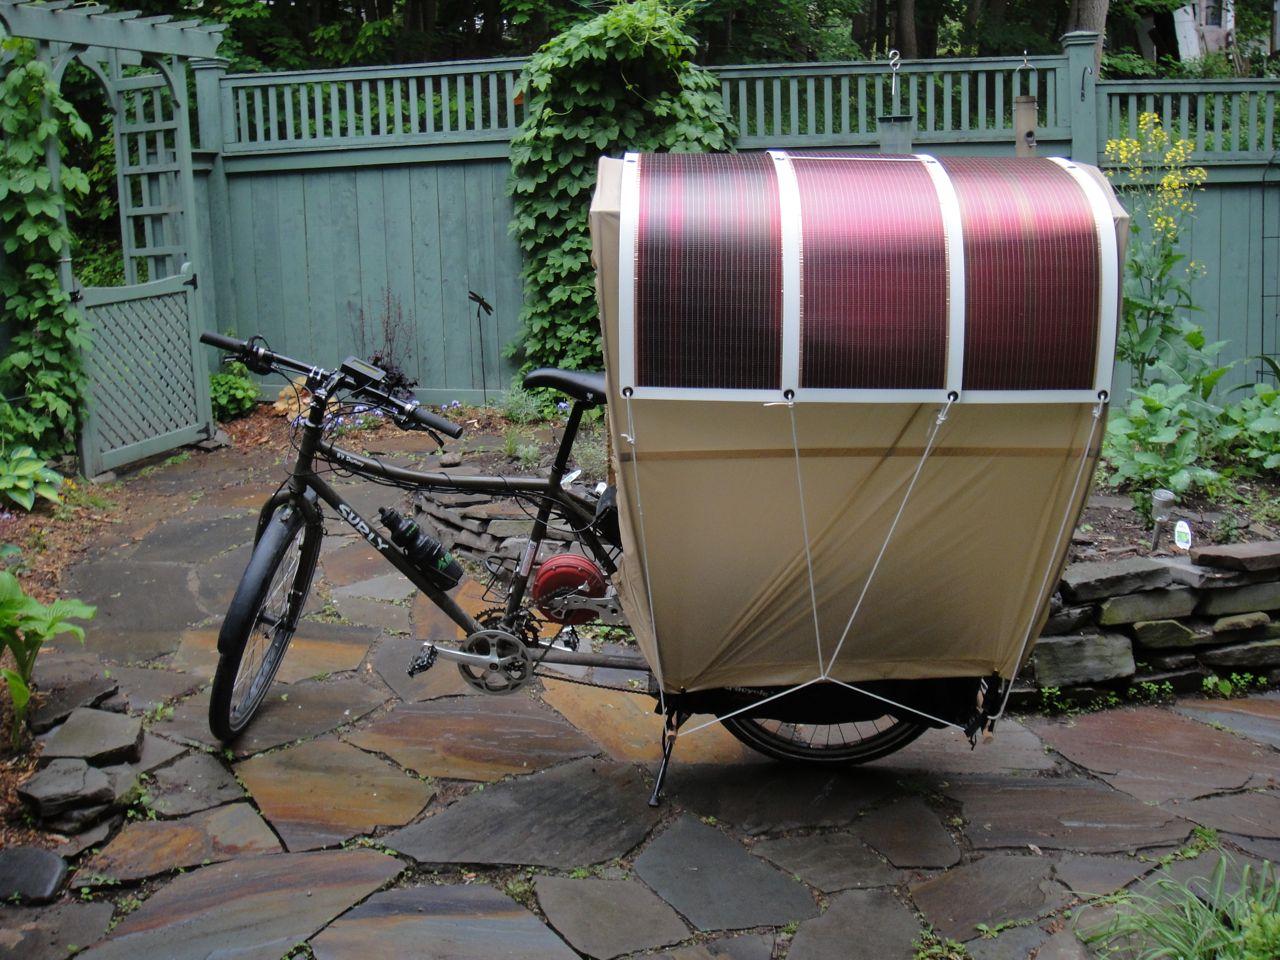 Solar-powered bike wagon. & Cycle Gear - Bikes As Transportation